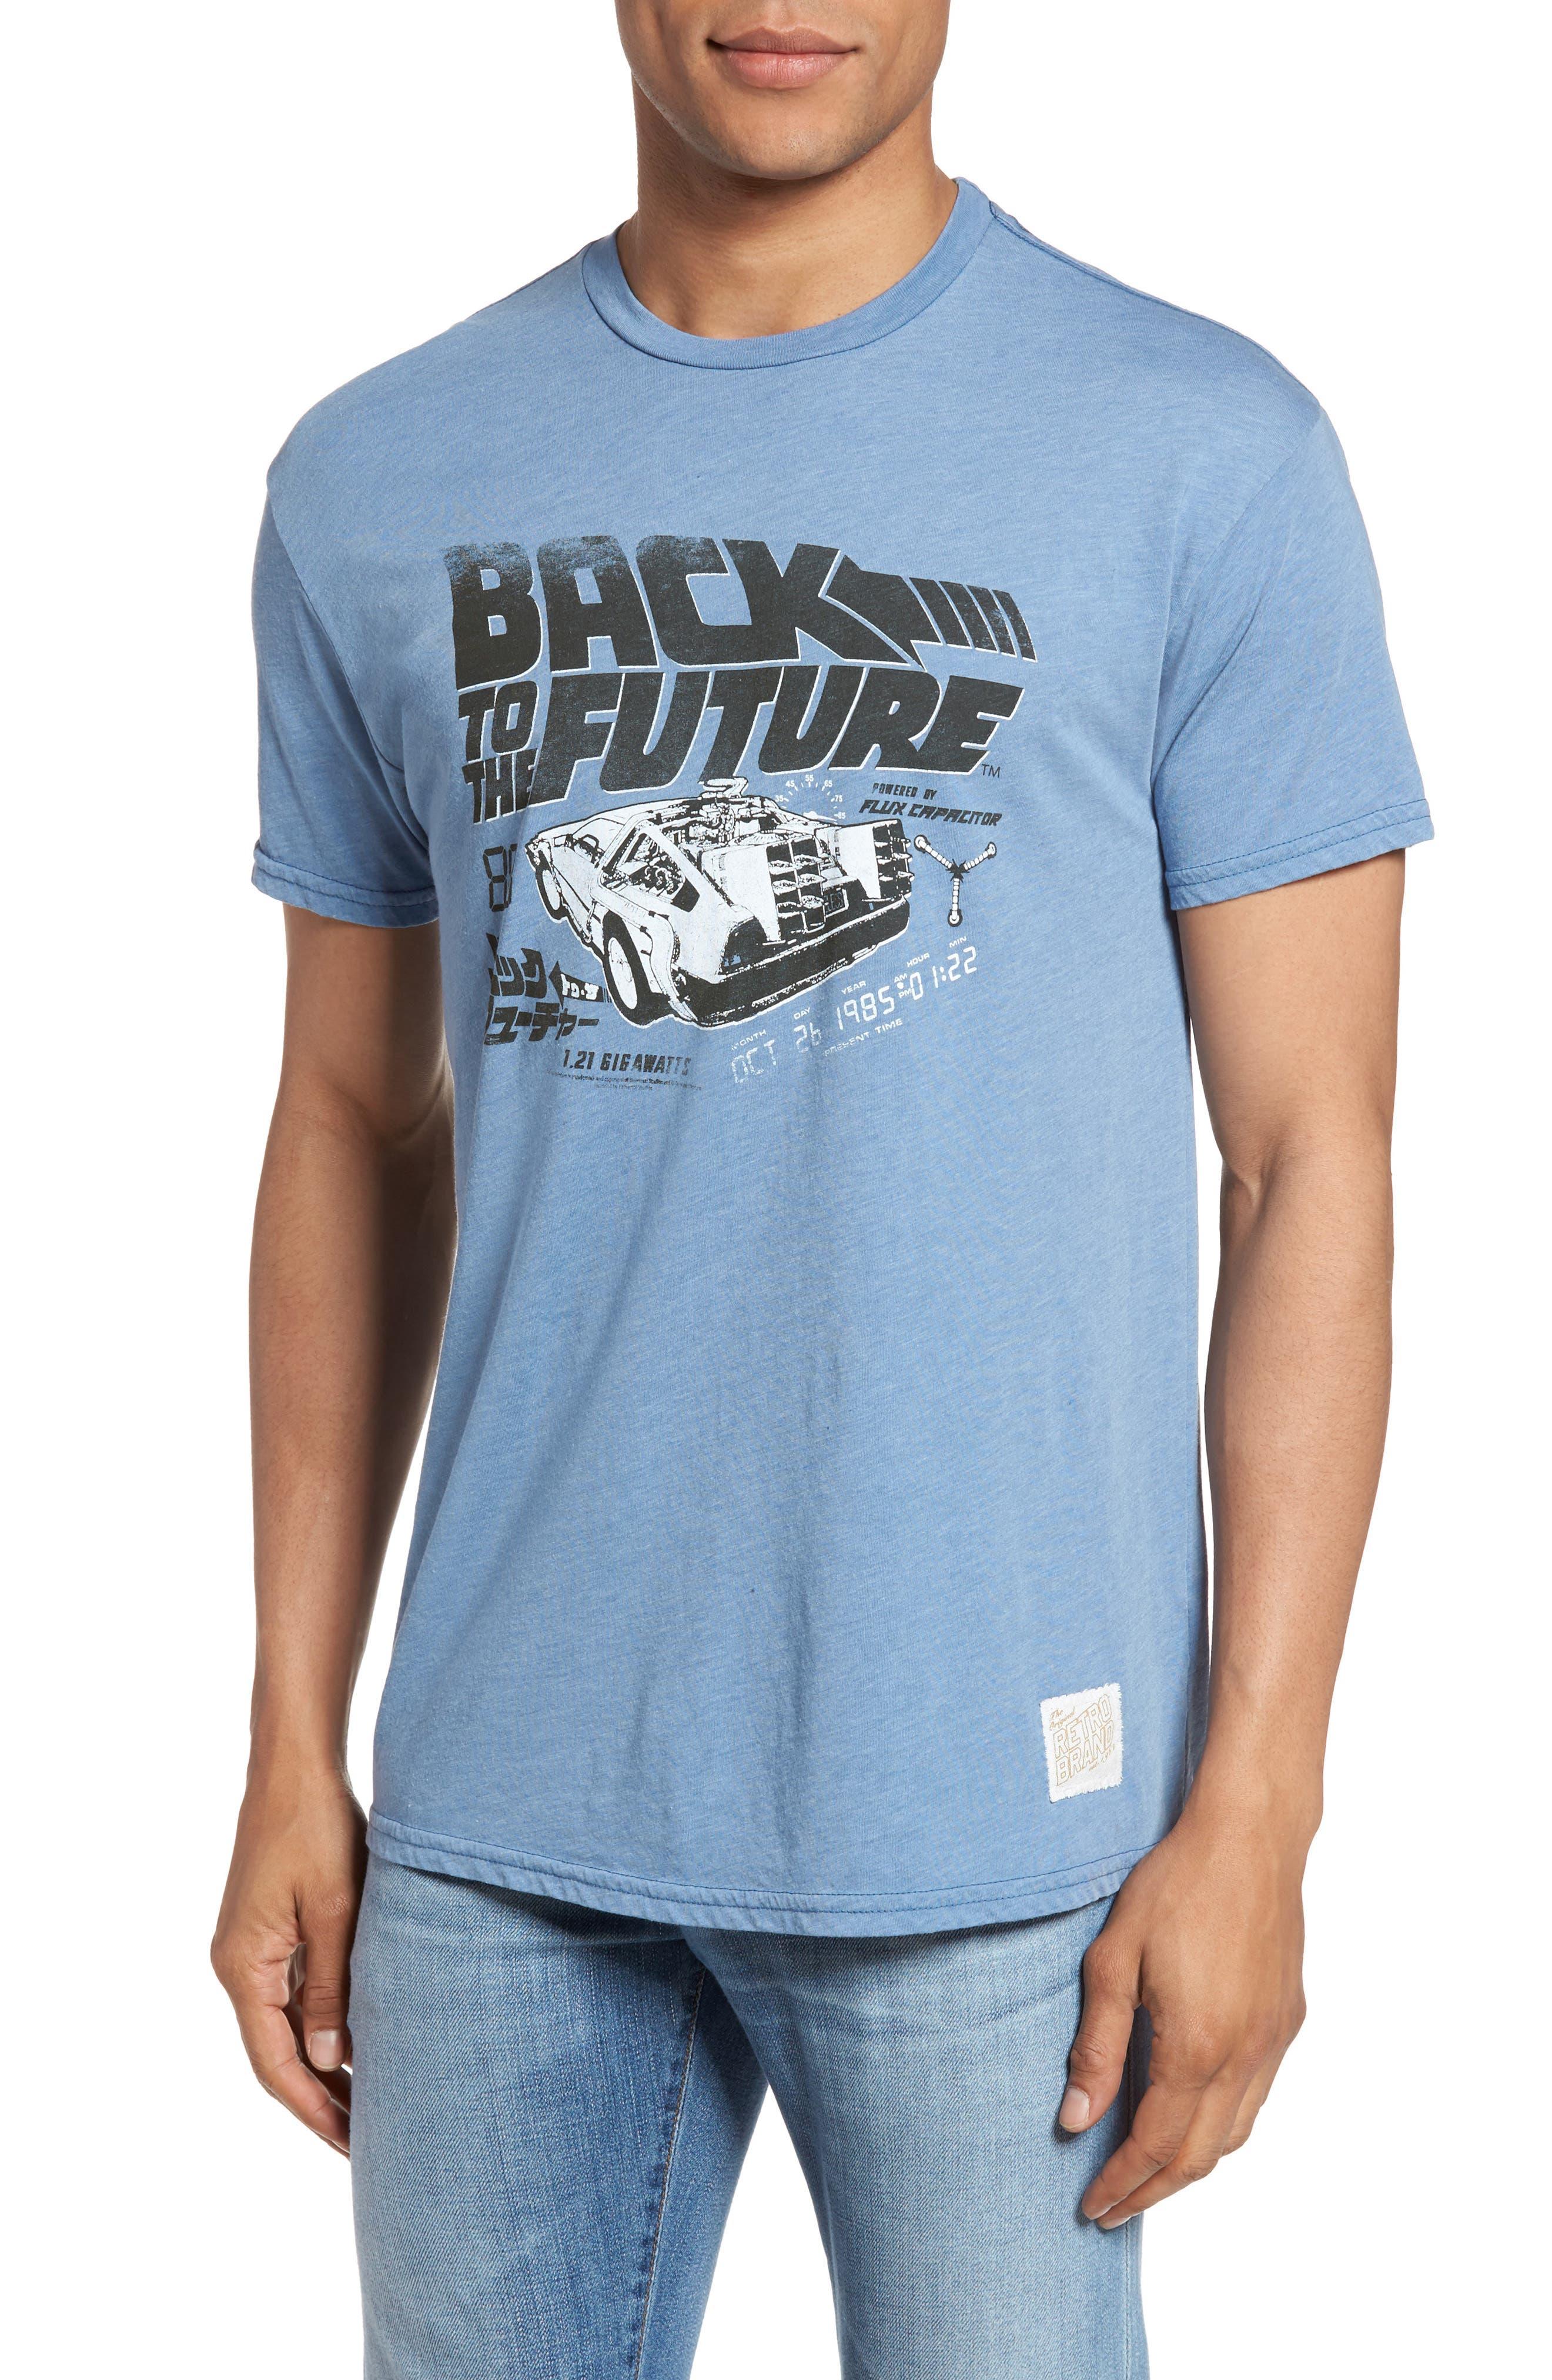 Retro Brand Back to the Future Graphic T-Shirt